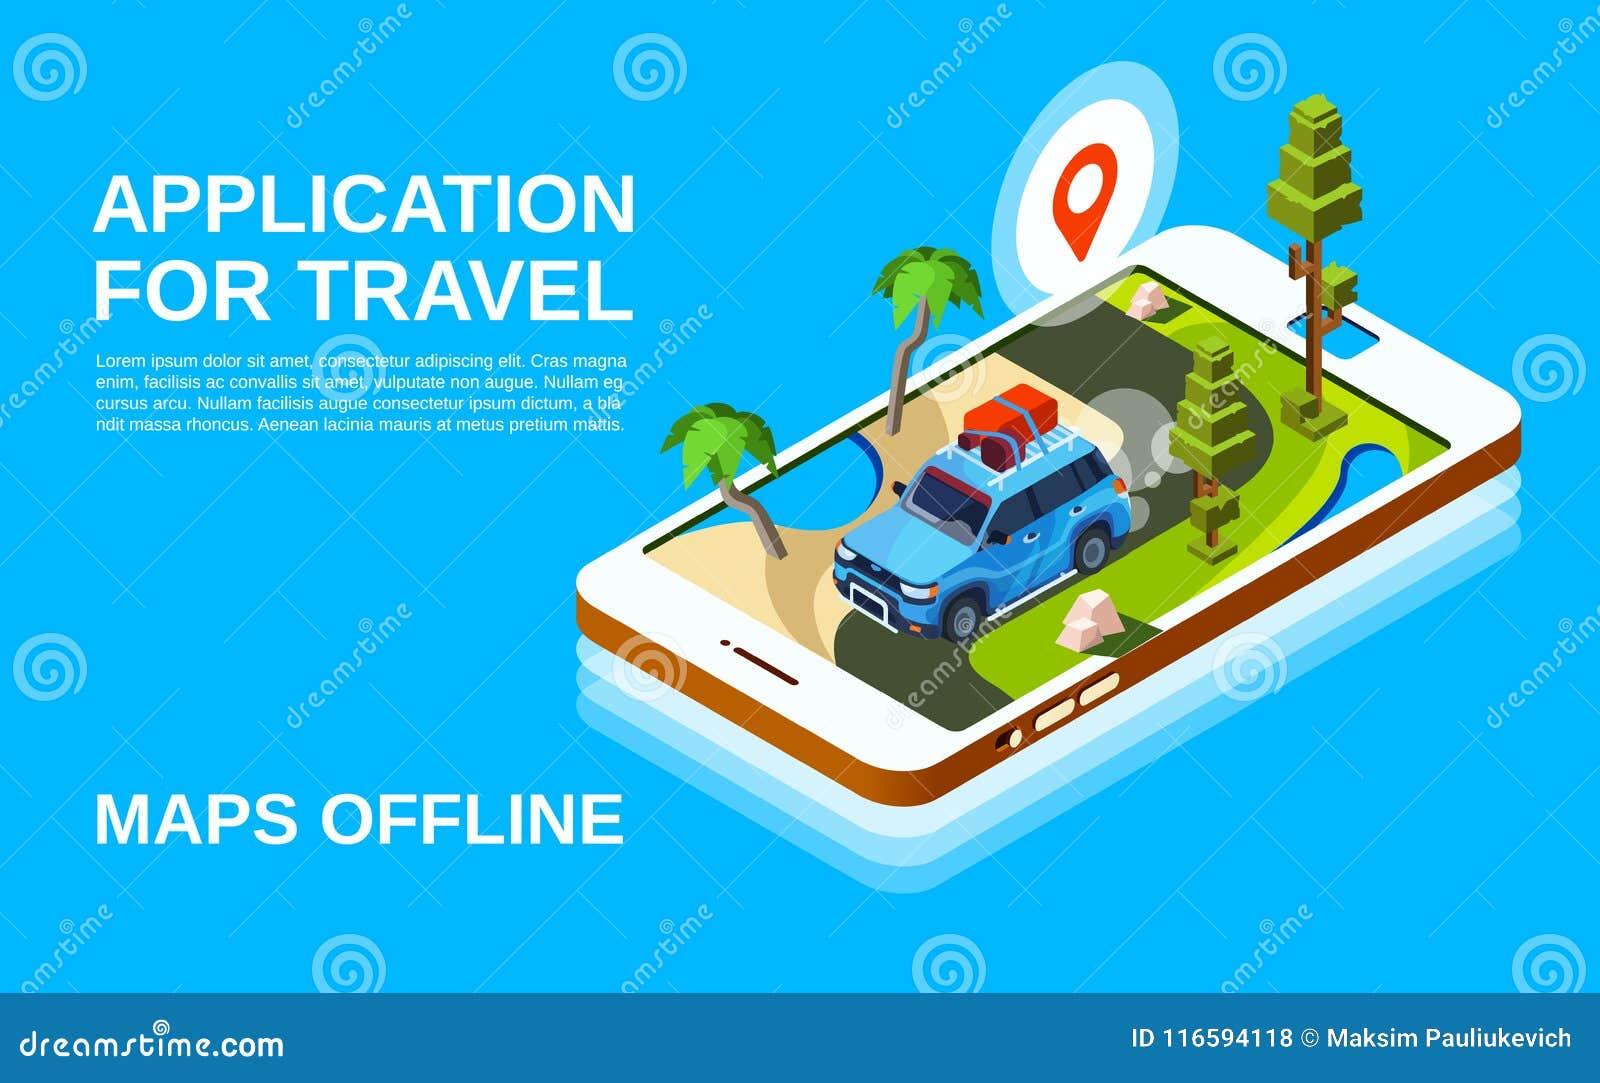 Travel Maps Application Vector Illustration Stock Vector